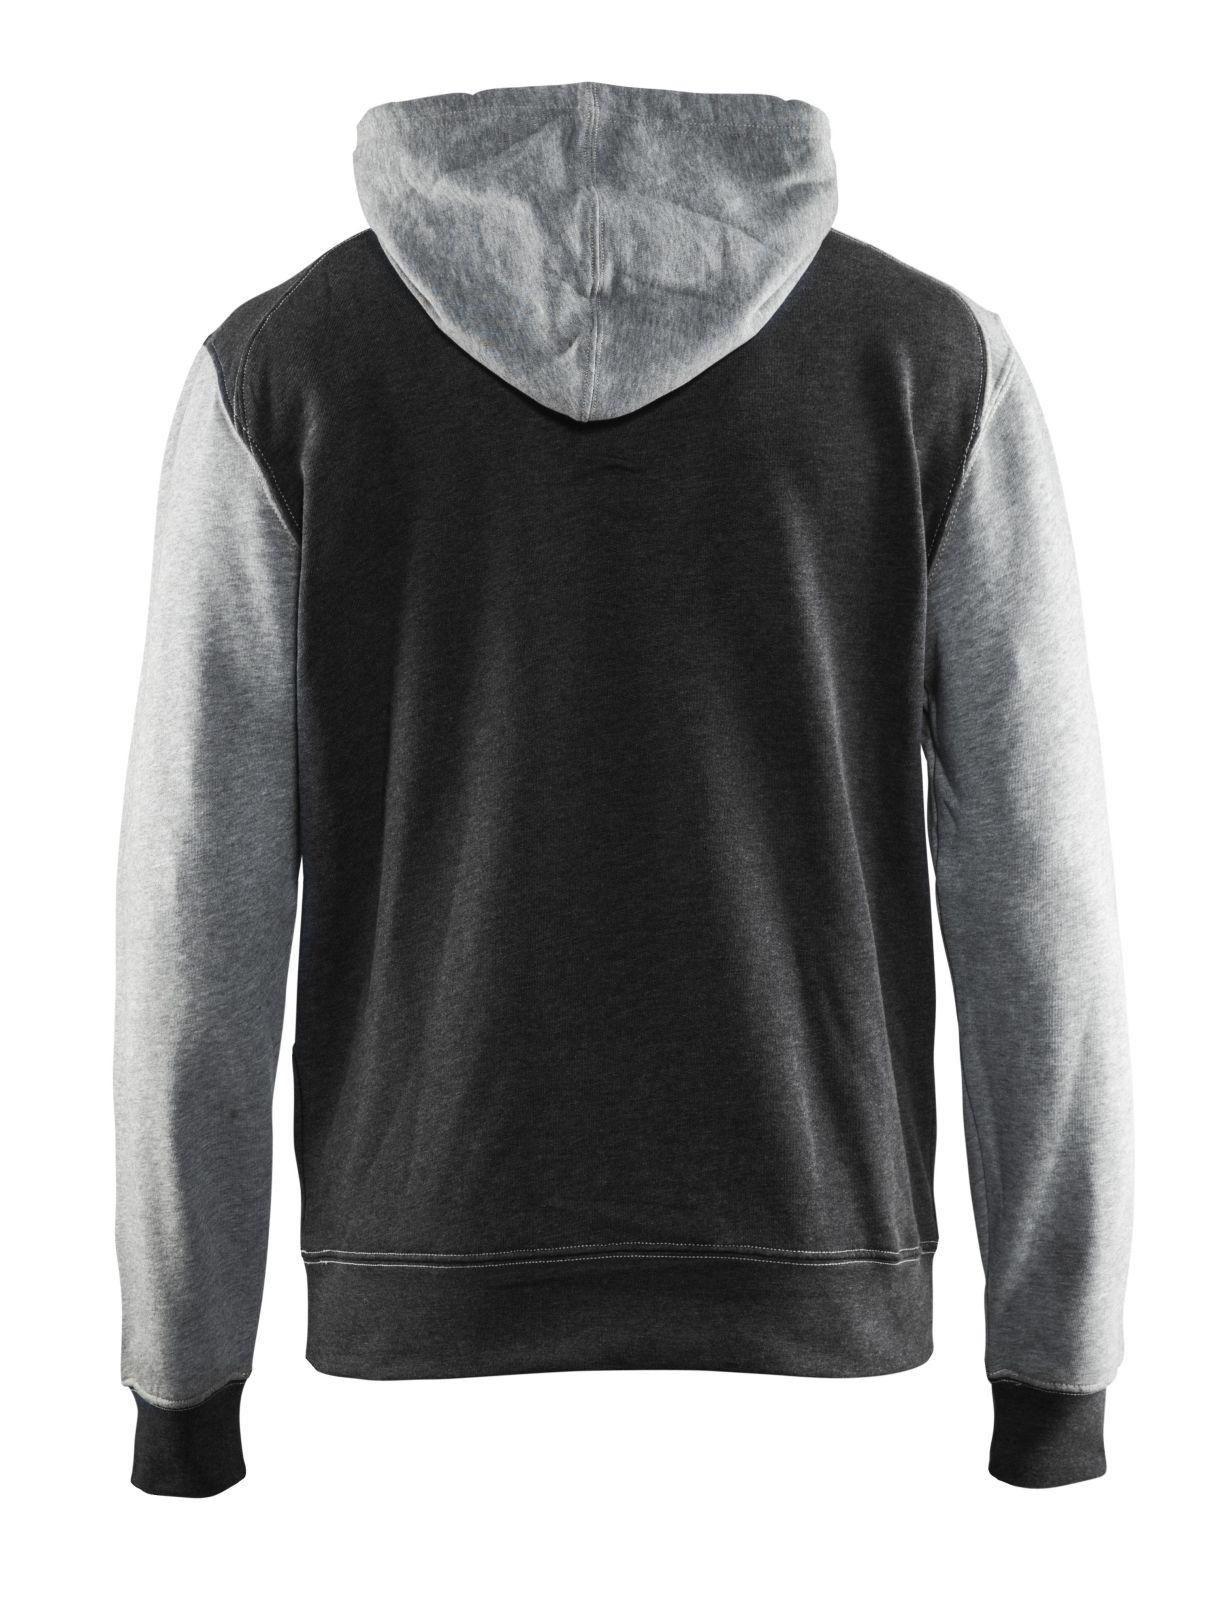 Blaklader Hooded sweatshirts 33991157 zwart melange-grijs(9990)